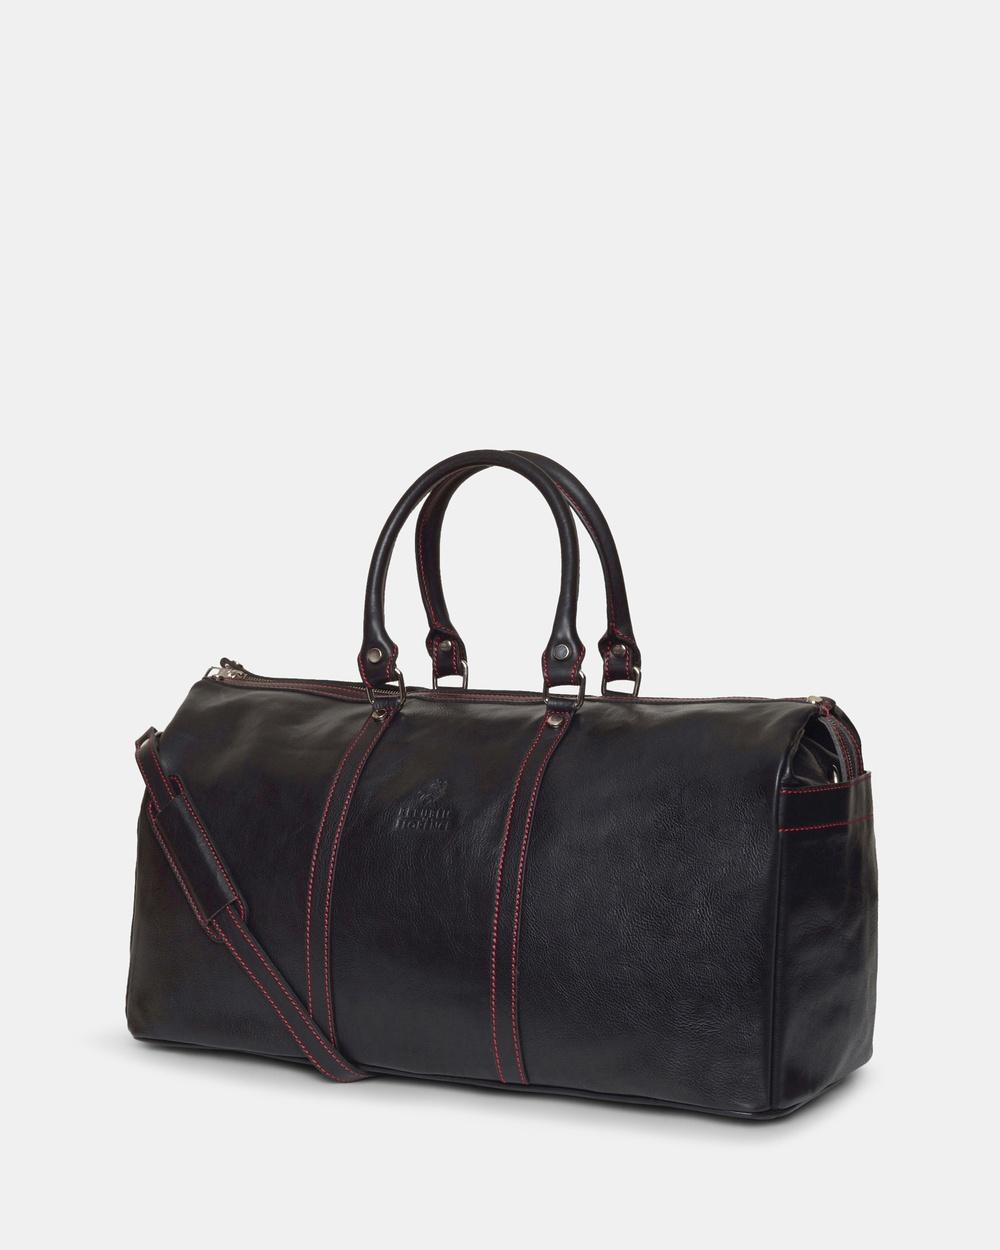 Republic of Florence Conti Black Duffle Bag Bags Black